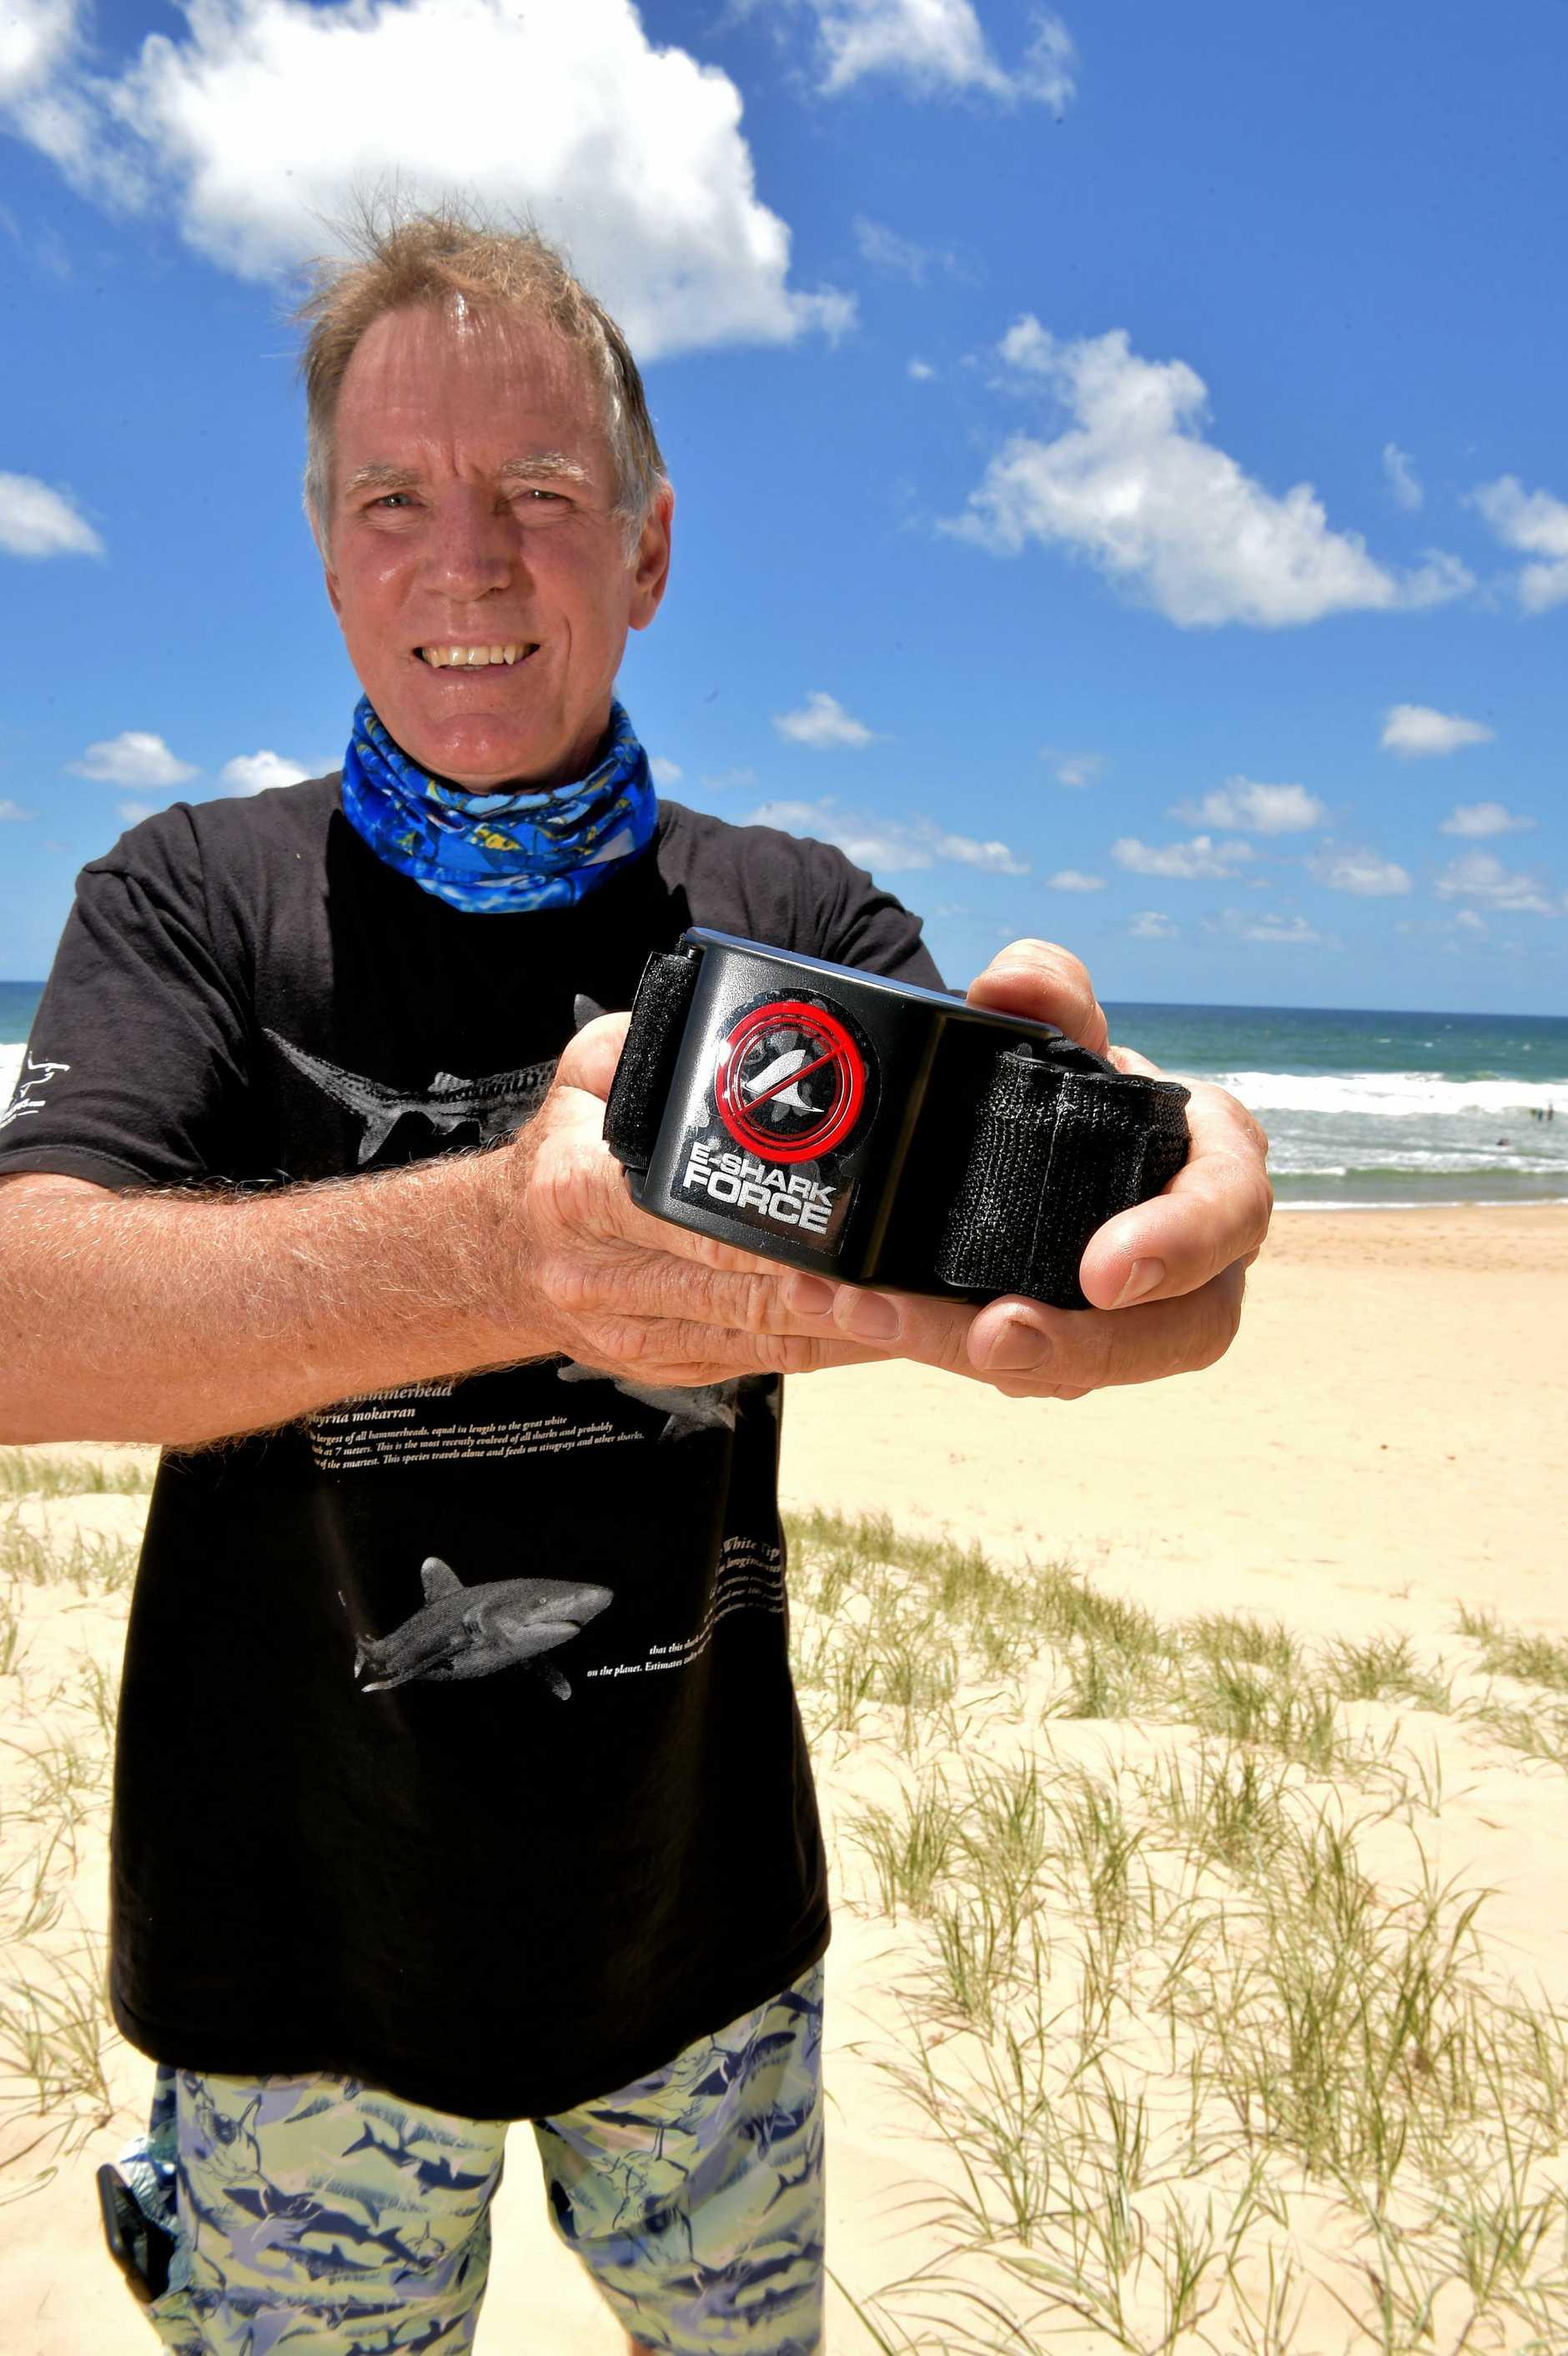 Tony Isaacson with the shark deterrent technology.